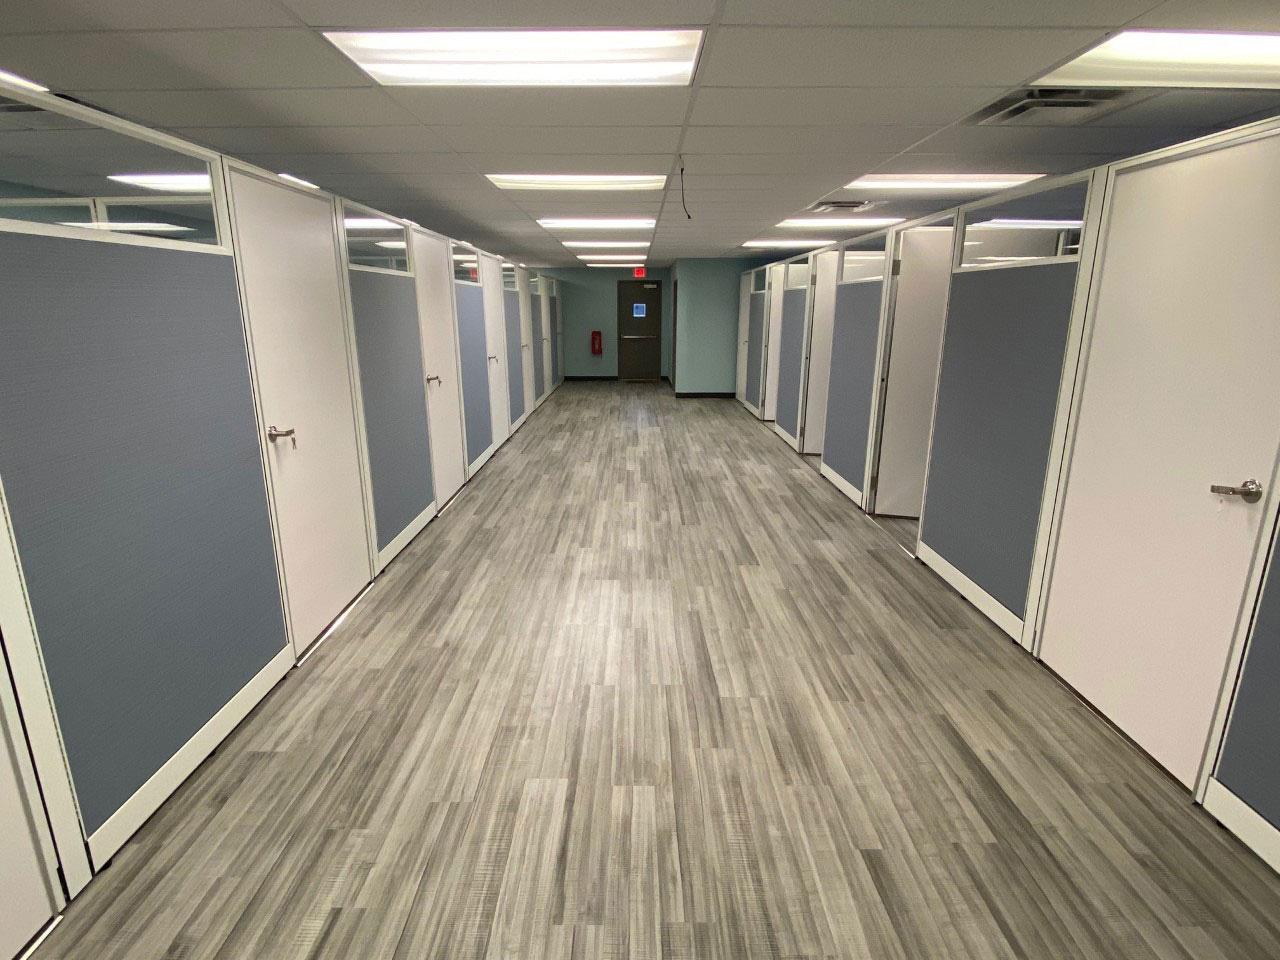 office-cubicle-furniture-suppliers-in-bradenton-florida-21.jpg